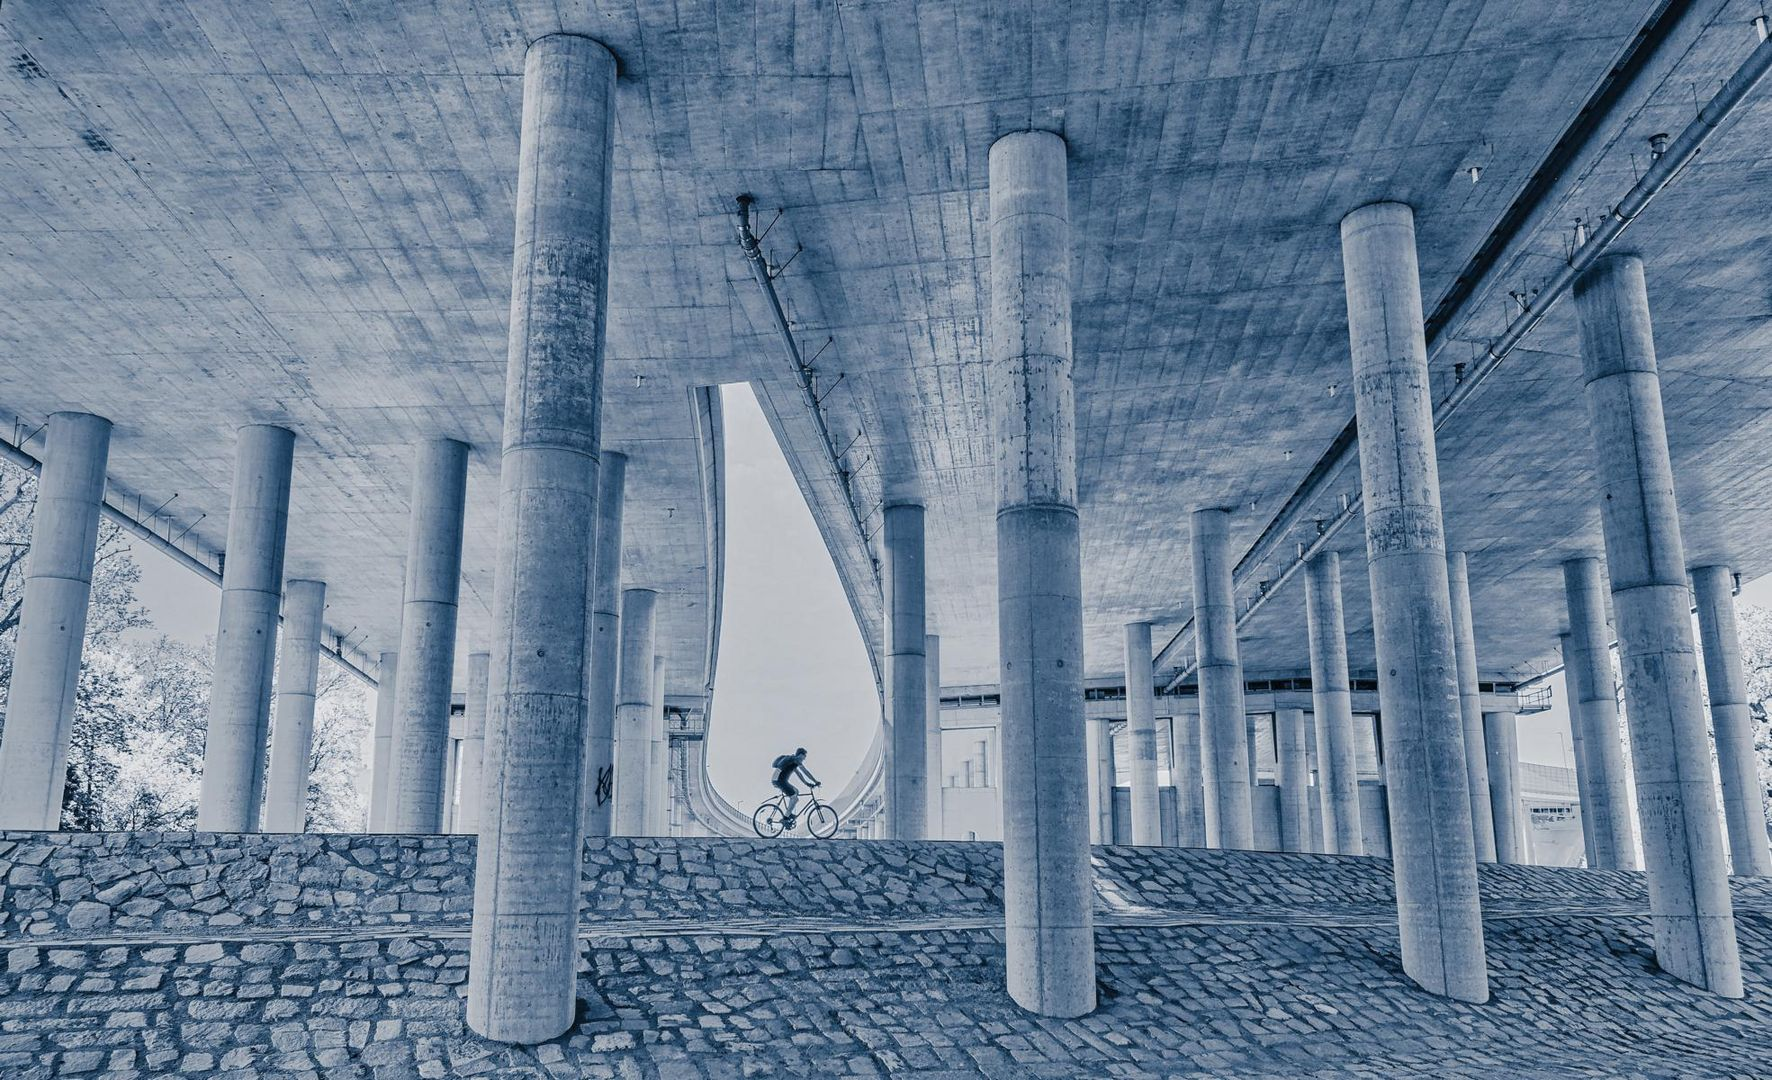 biker under highway